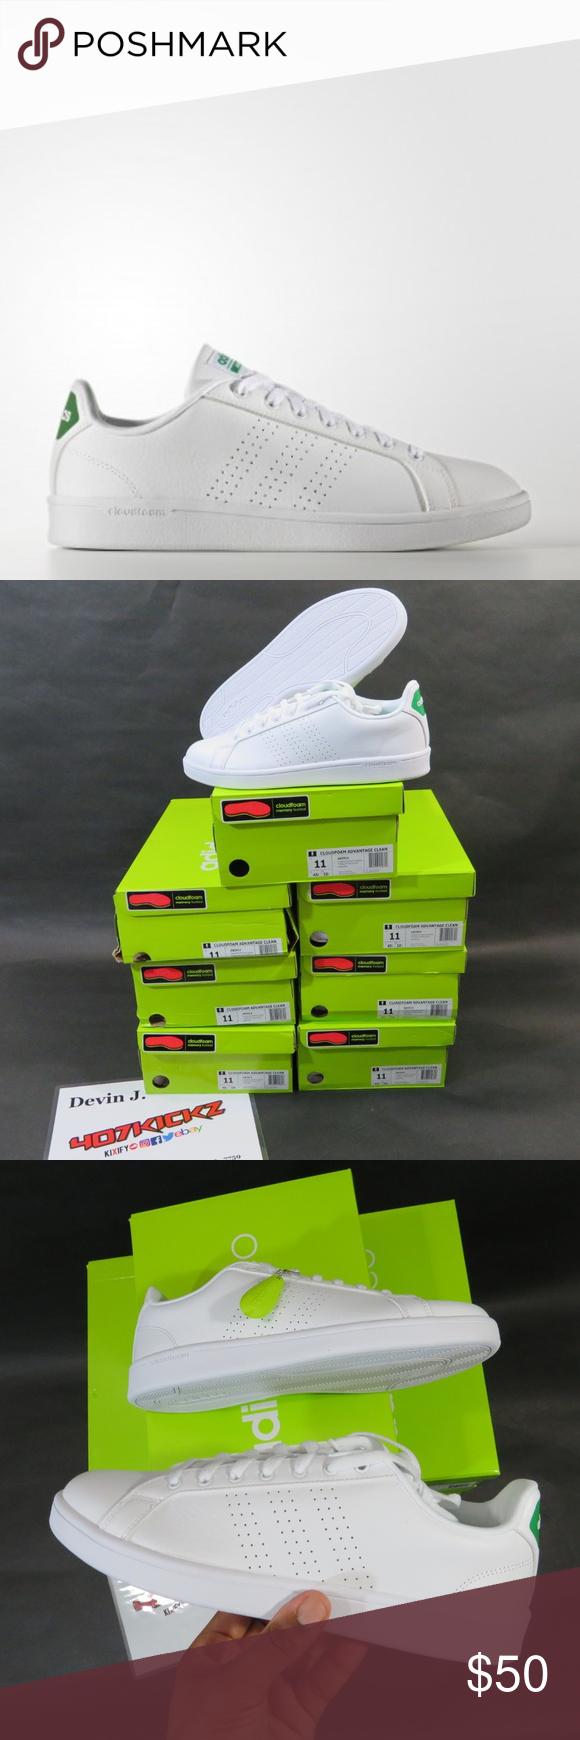 adidas Neo Cloudfoam Advantage Clean Whitegreen Aw3914 Mens